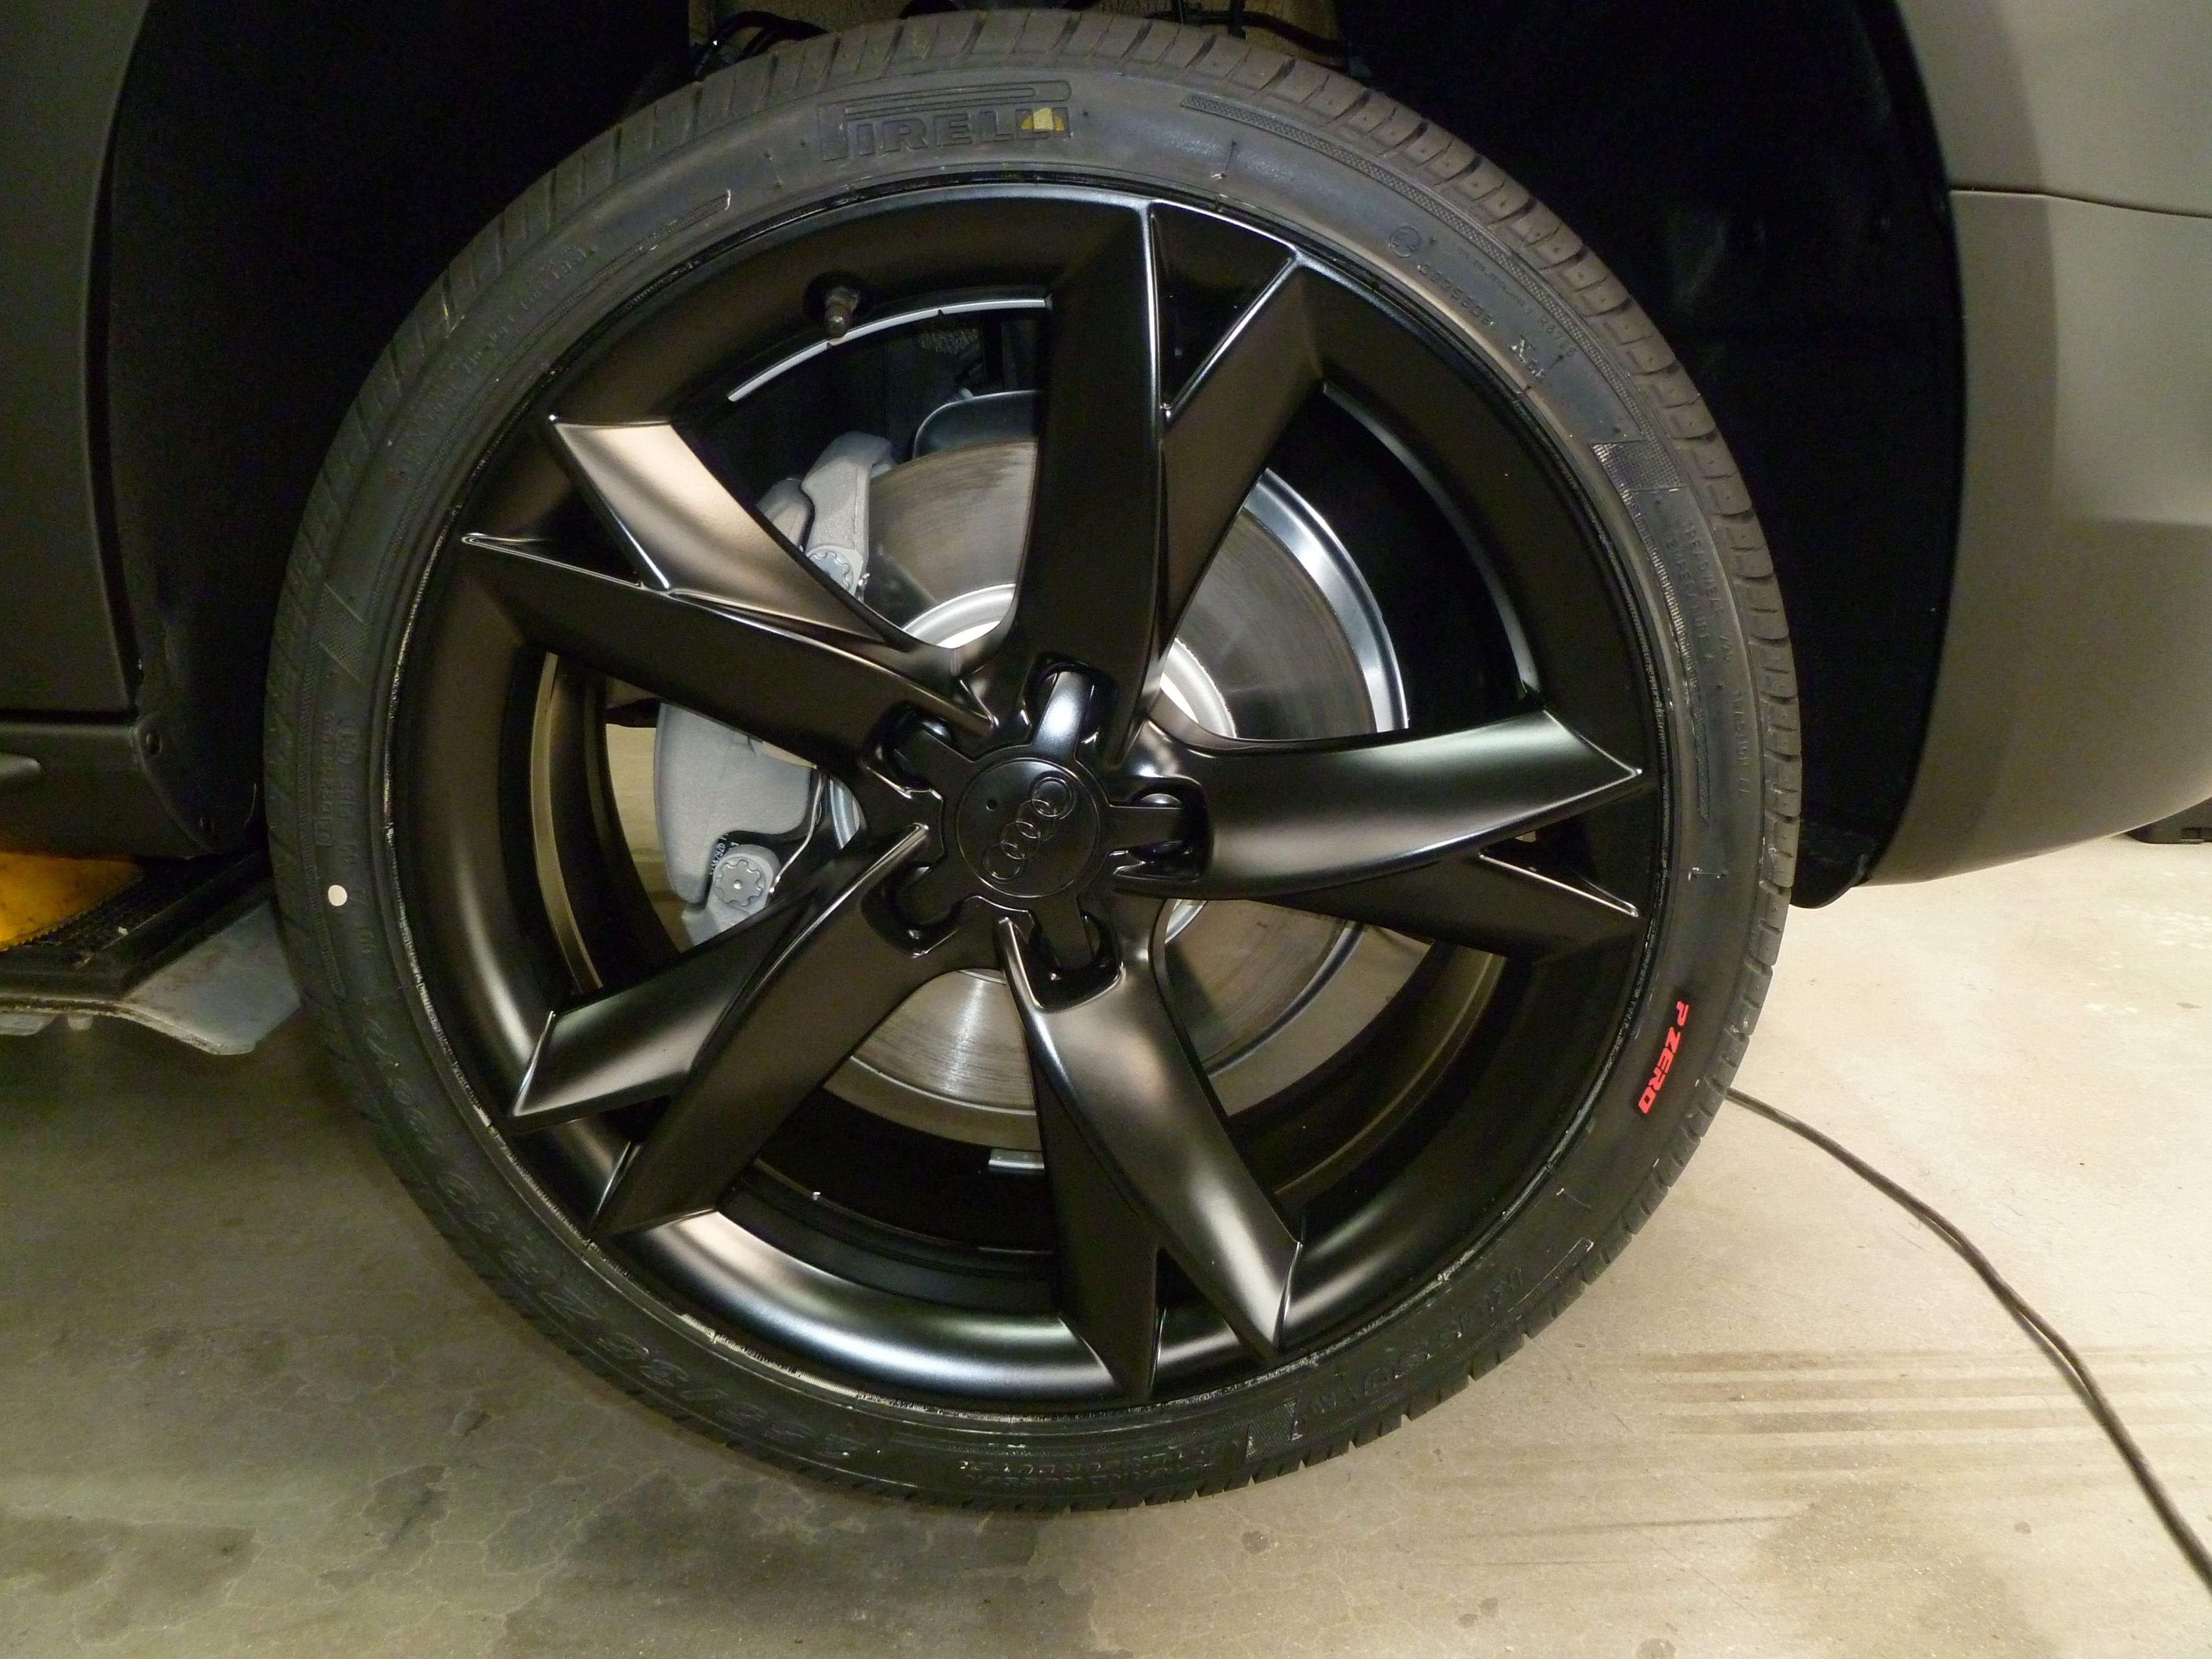 Audi A5 Coupe met Mat Zwarte Wrap, Carwrapping door Wrapmyride.nu Foto-nr:4650, ©2021